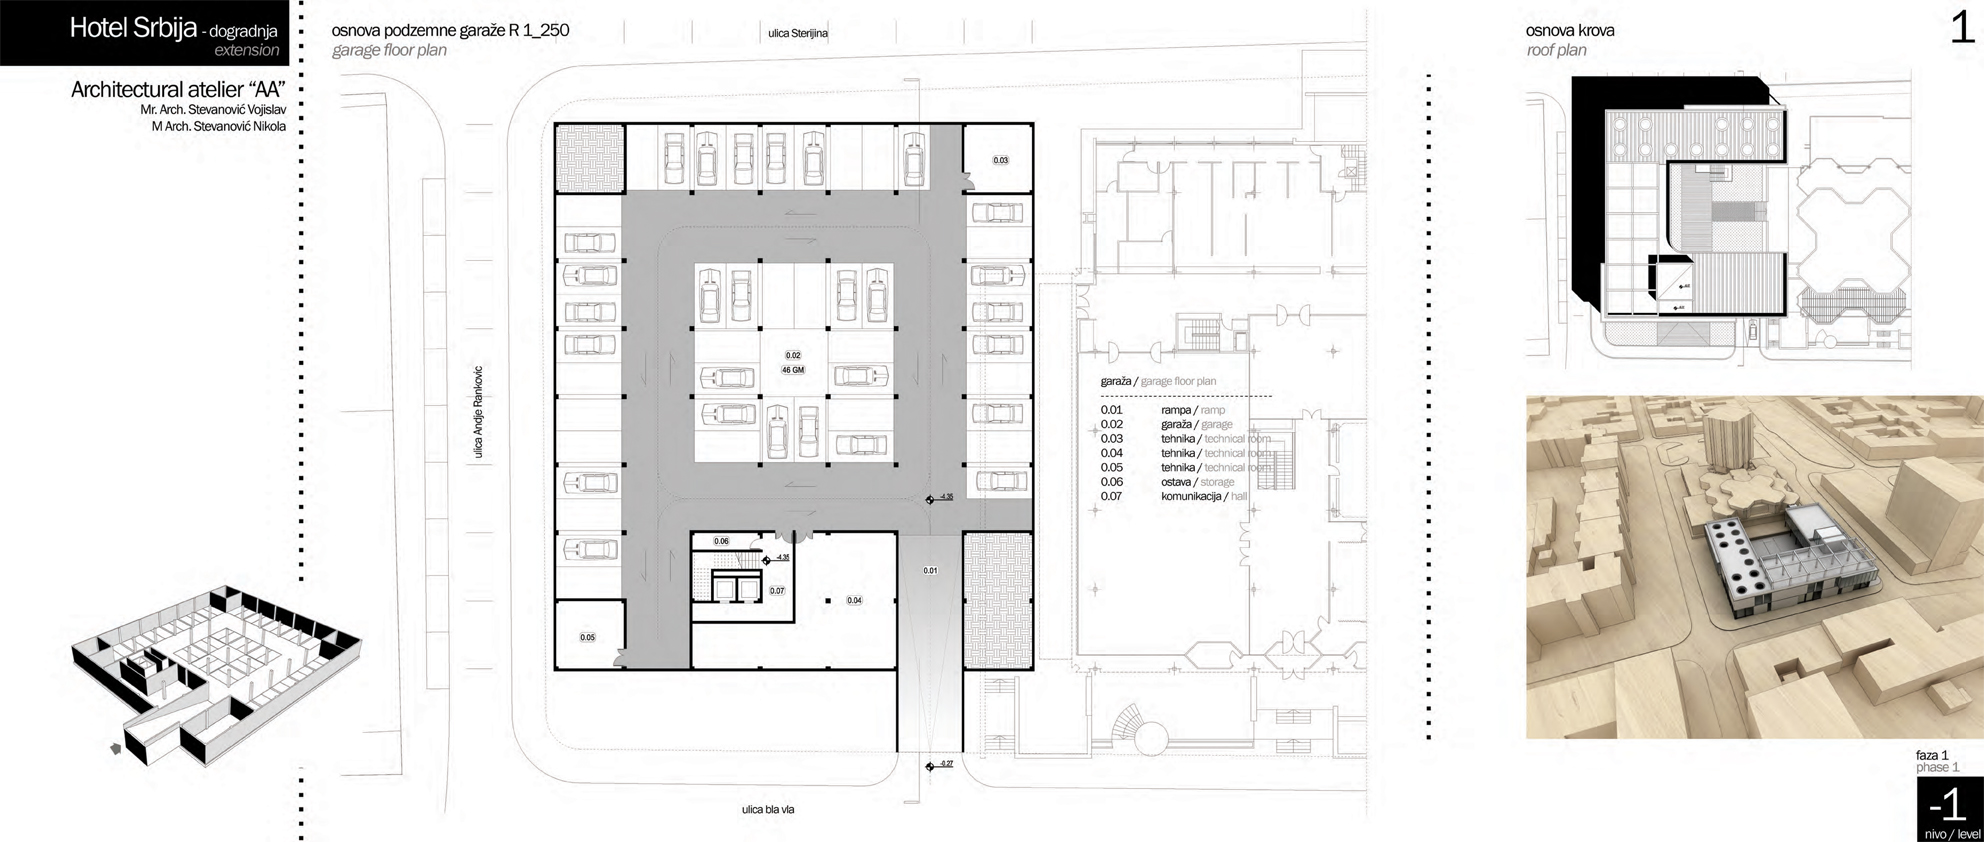 competition-hotel-srbija-extension-vrsac_aa-3